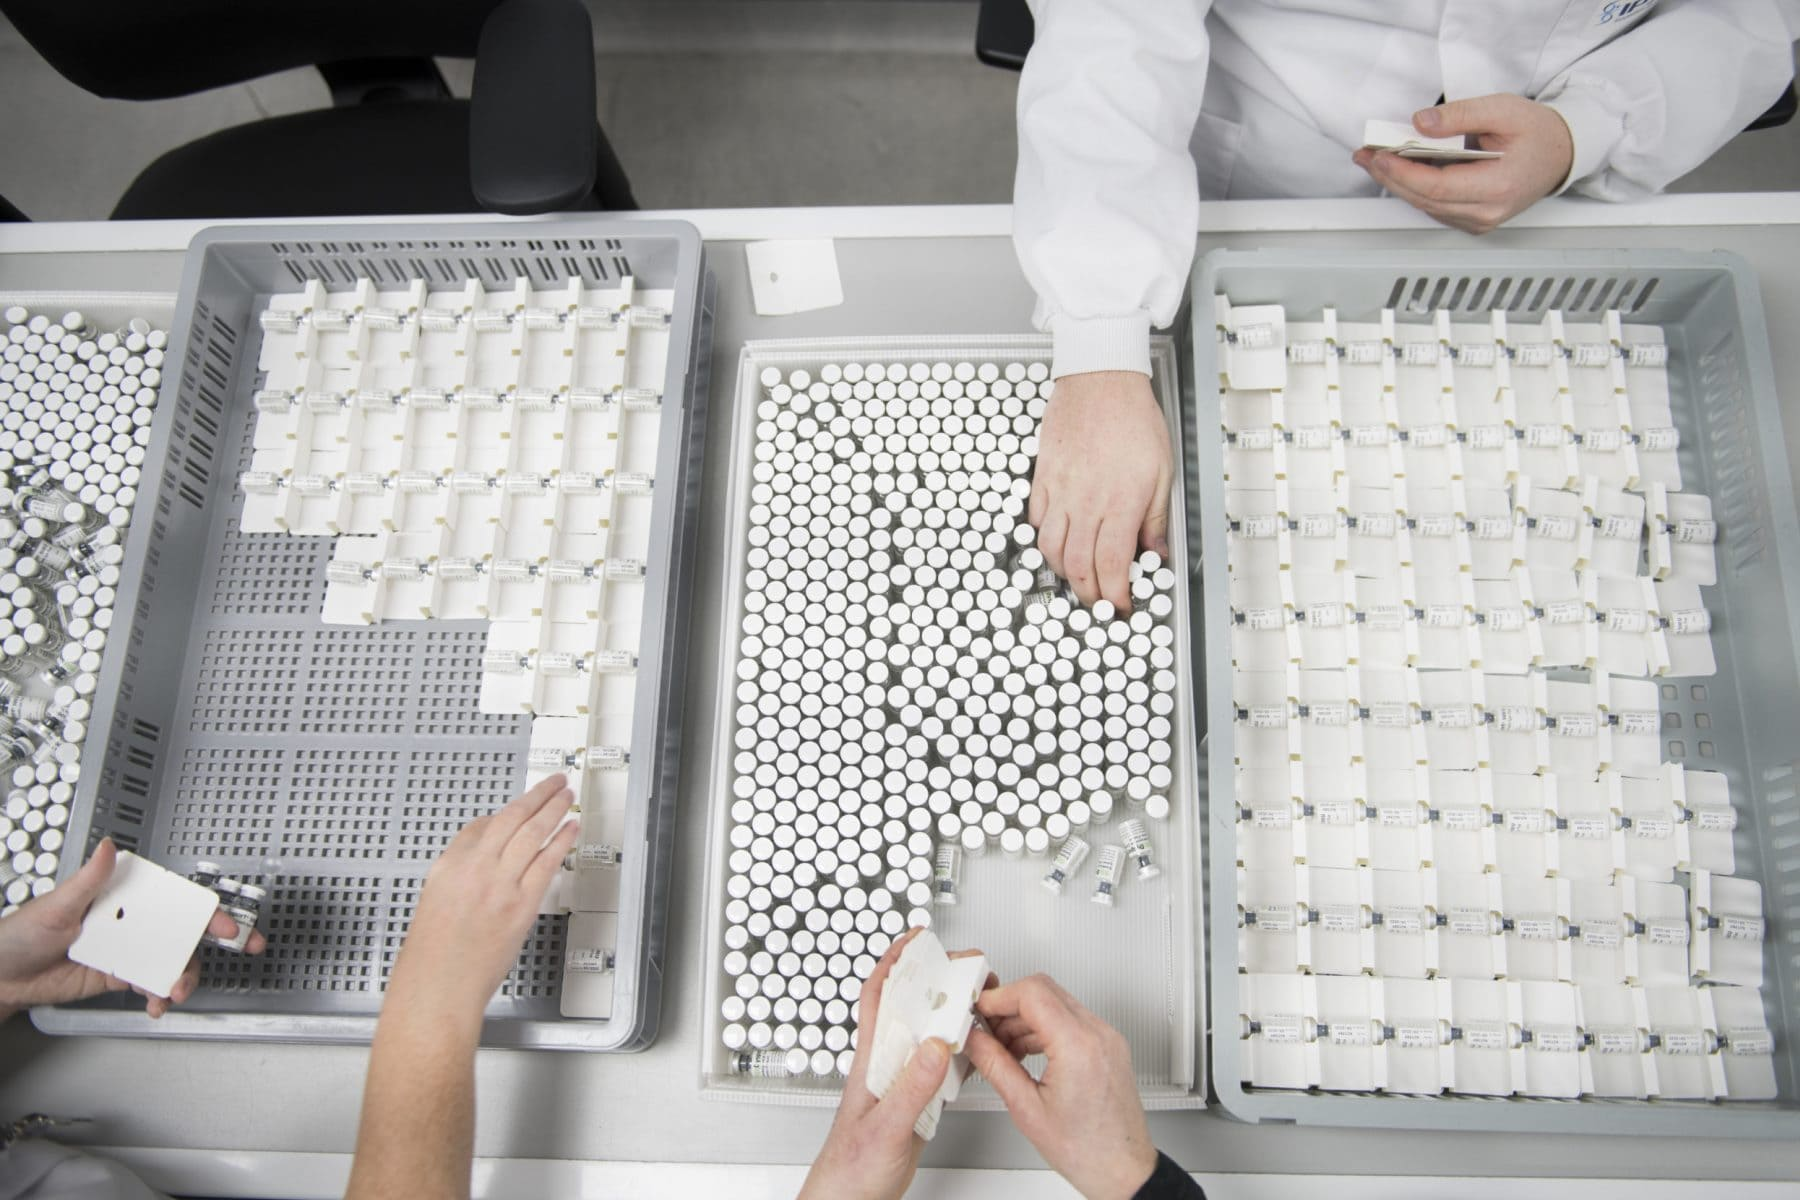 Компания Ipsen, производство